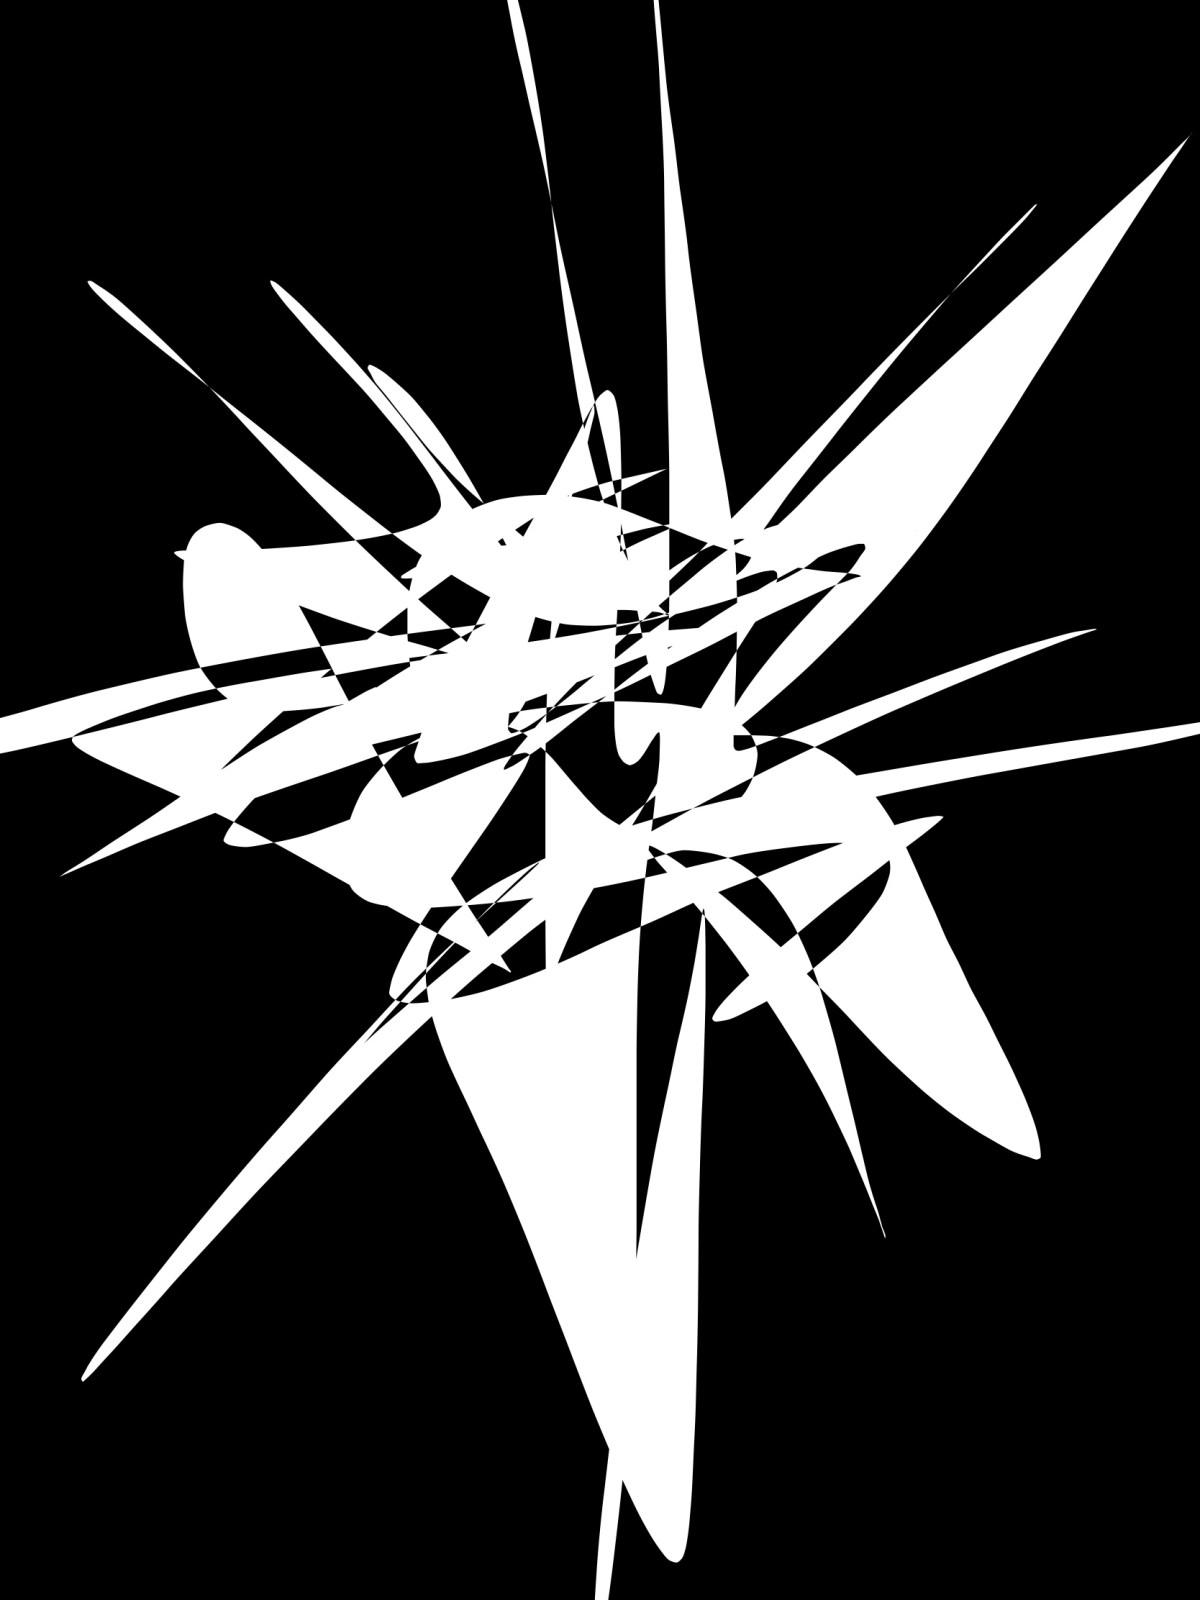 black white abstract explosion ERIC KIM